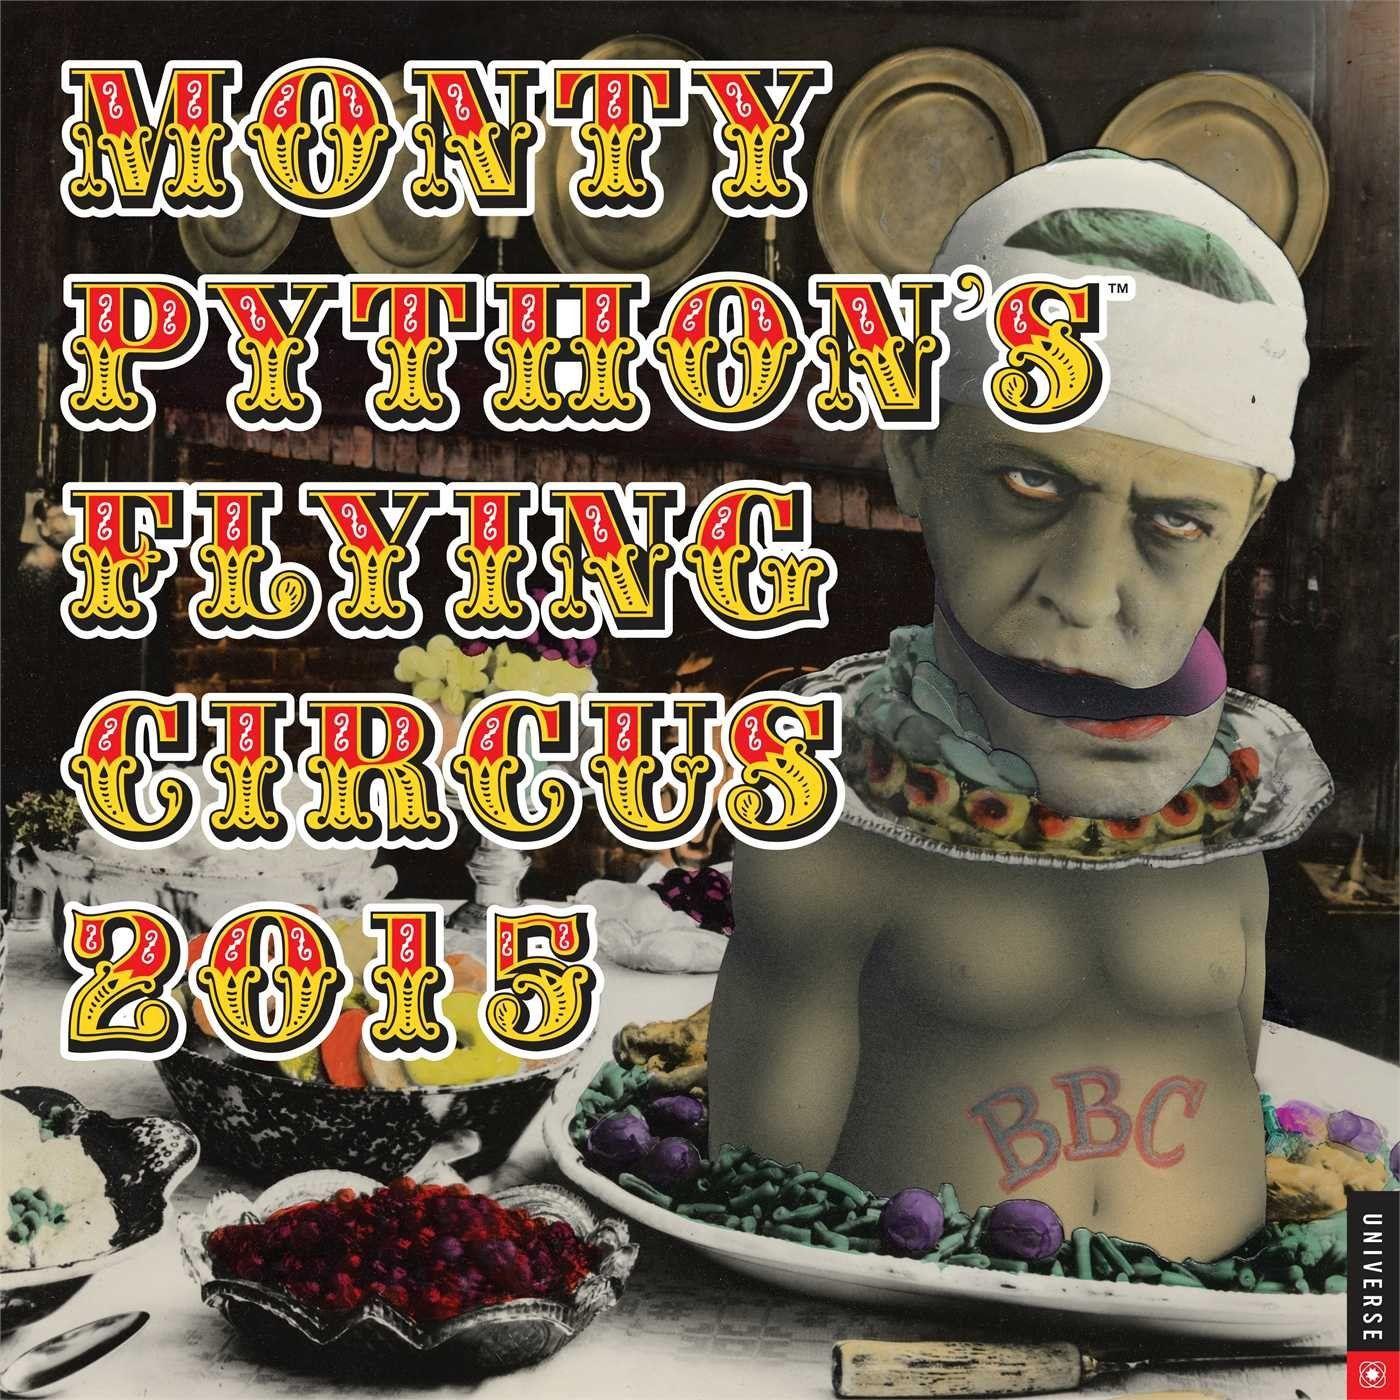 Monty-Python-Monty-Python-s-Flying-Circus-Calendar-2015